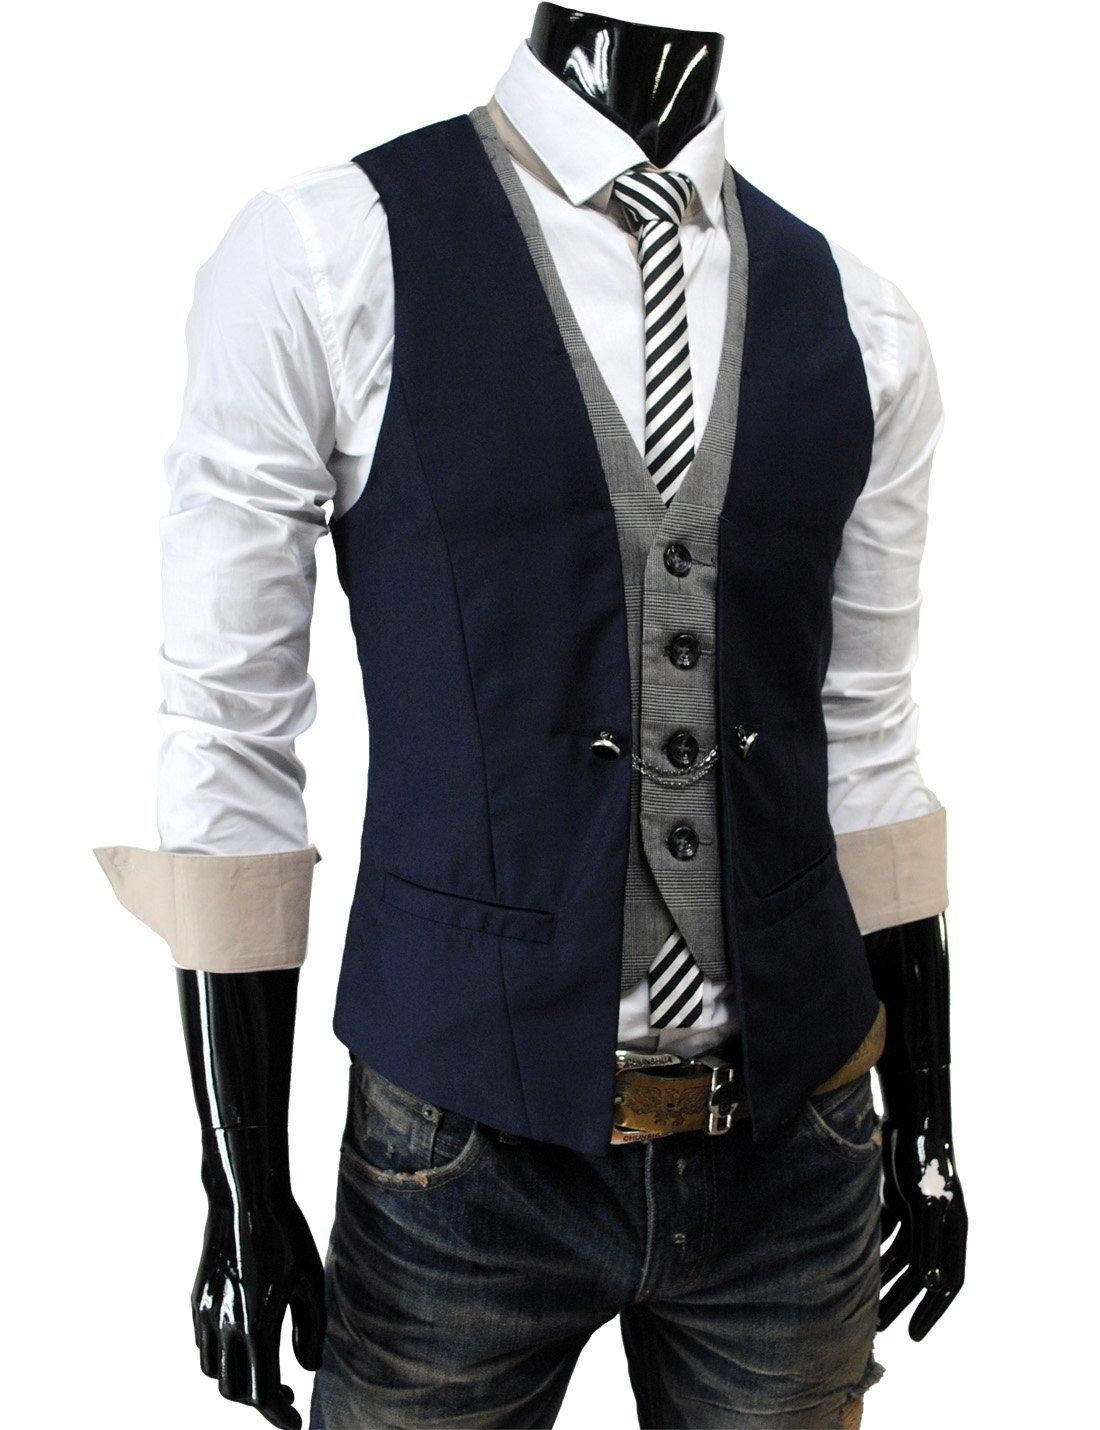 Chaleco De Hombre Color Azul Marino By Thelees Jpg 1100 1430 Chalecos De Moda Hombre Moda Ropa Hombre Estilo De Ropa Hombre